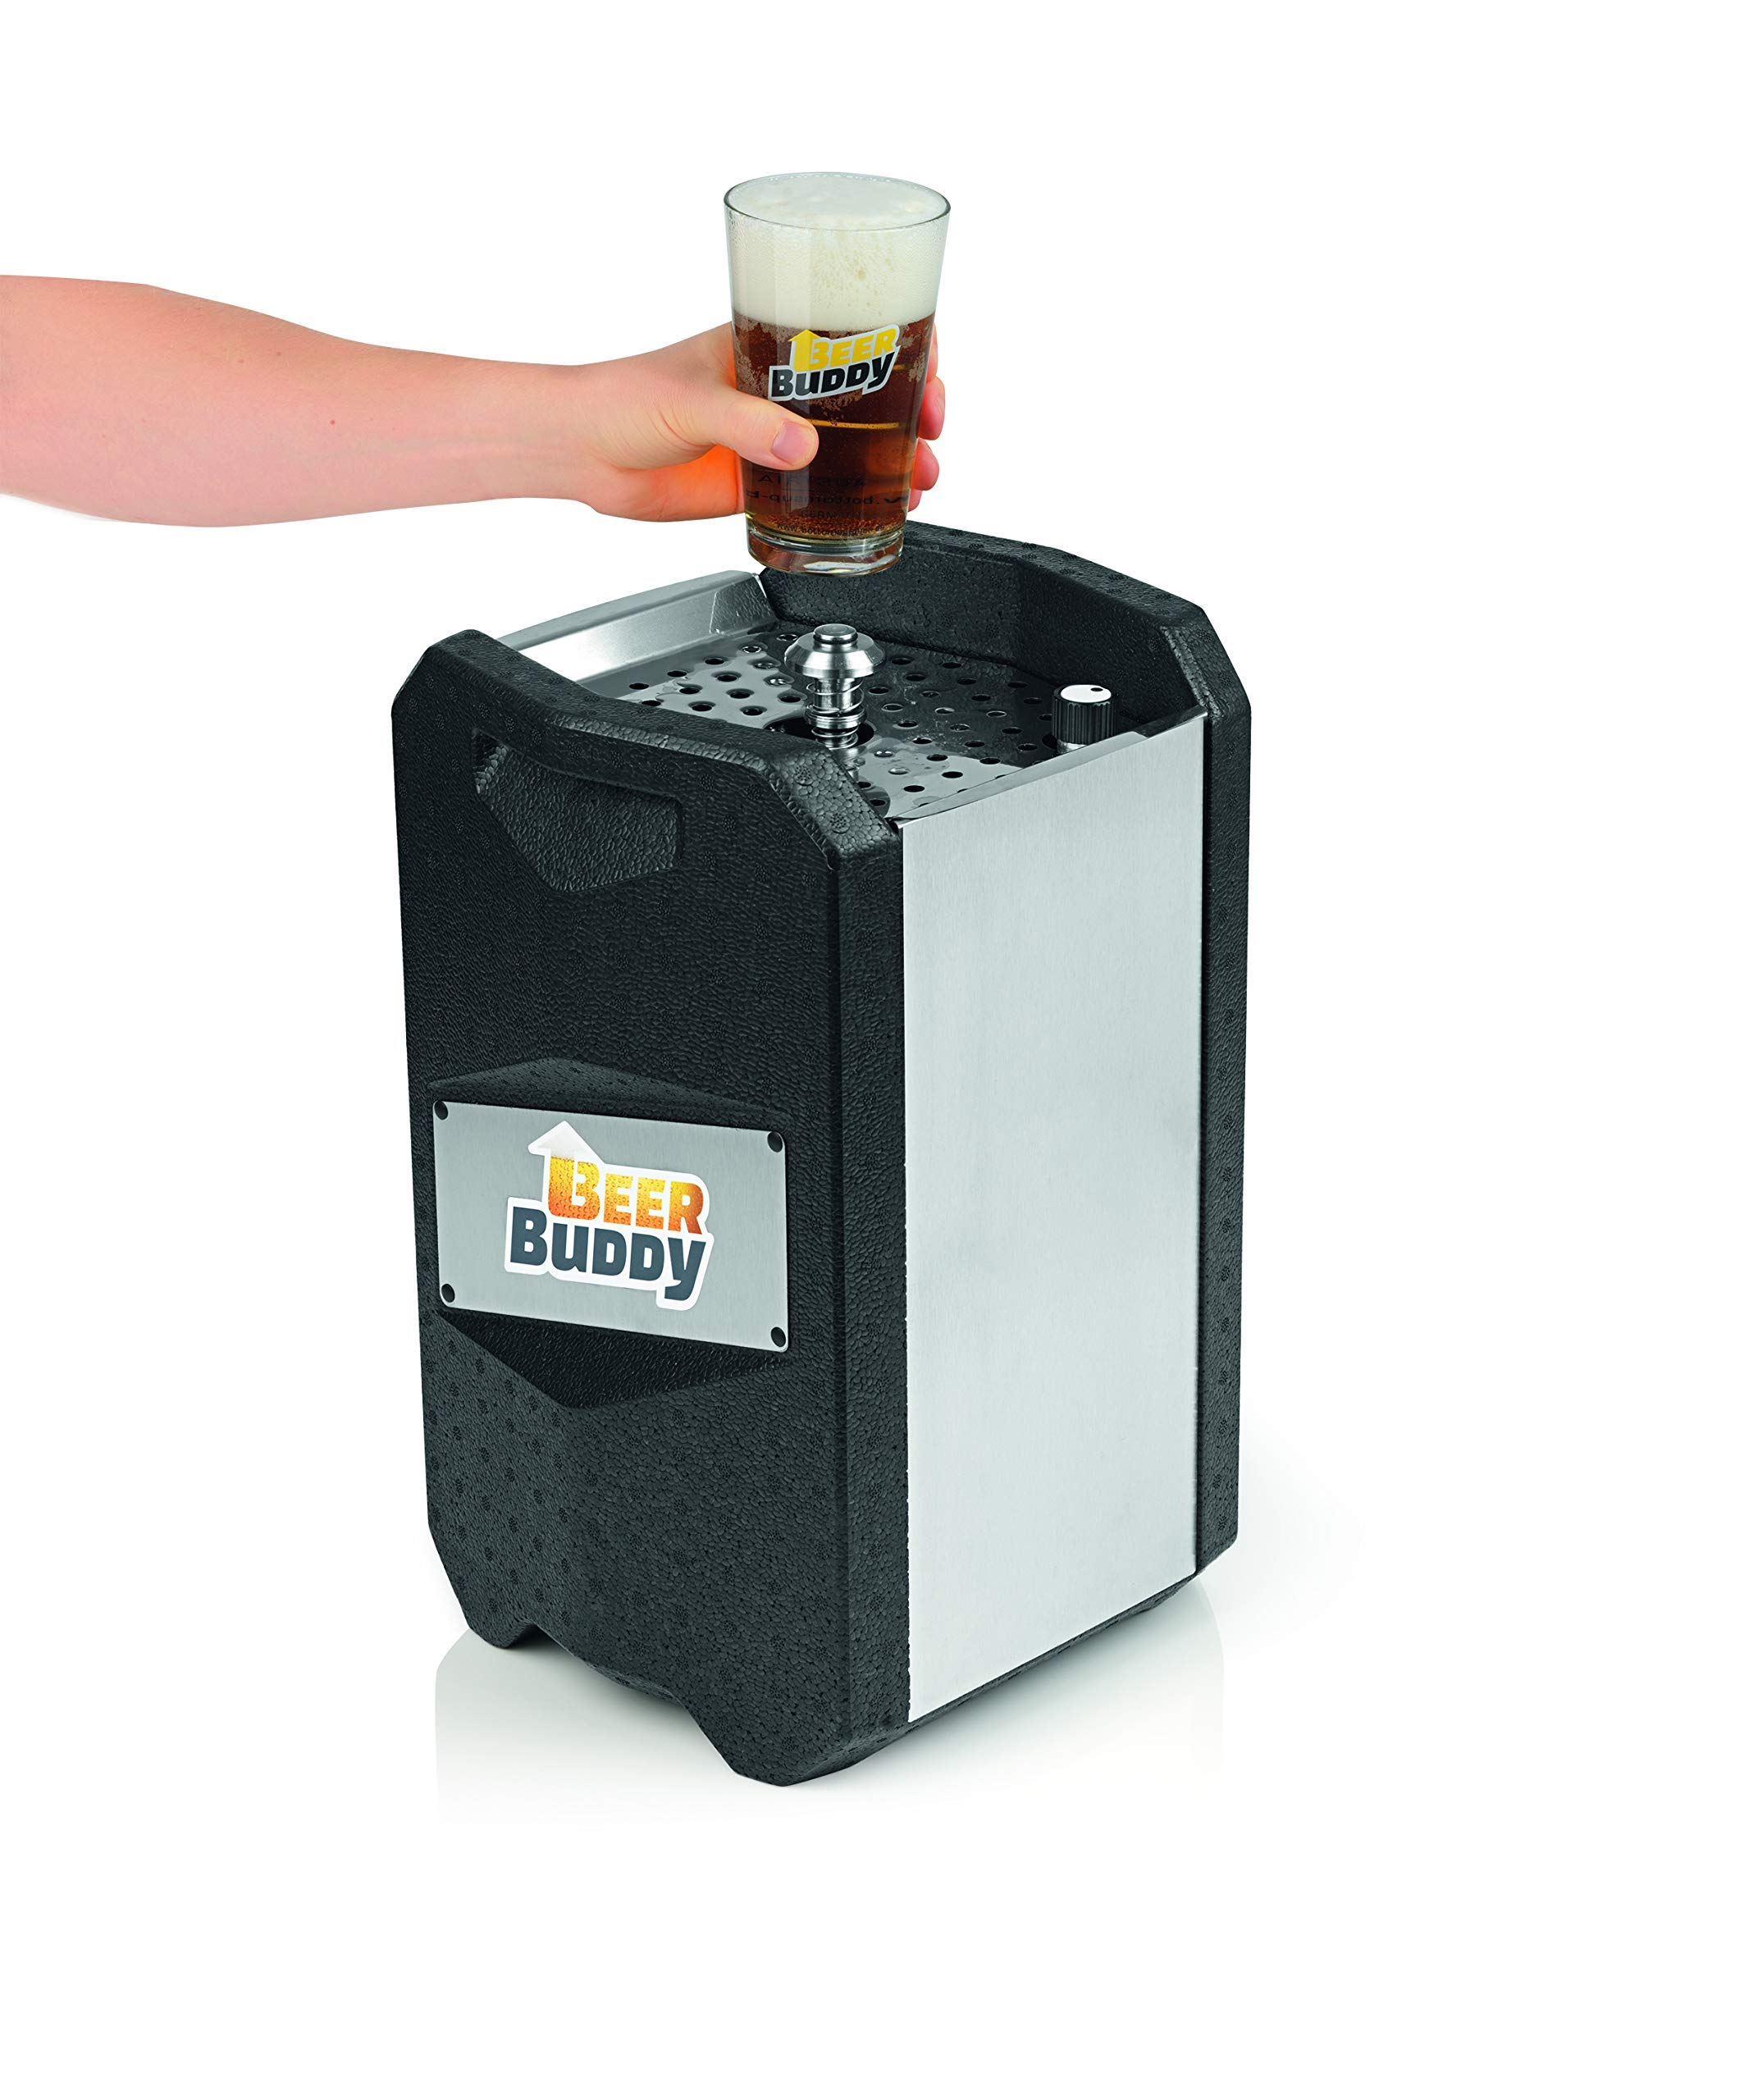 81BHk99l24L - Beer Buddy Version 2.0 latest version. Bottoms Up Beer Tap for 5 Litre Party Barrels